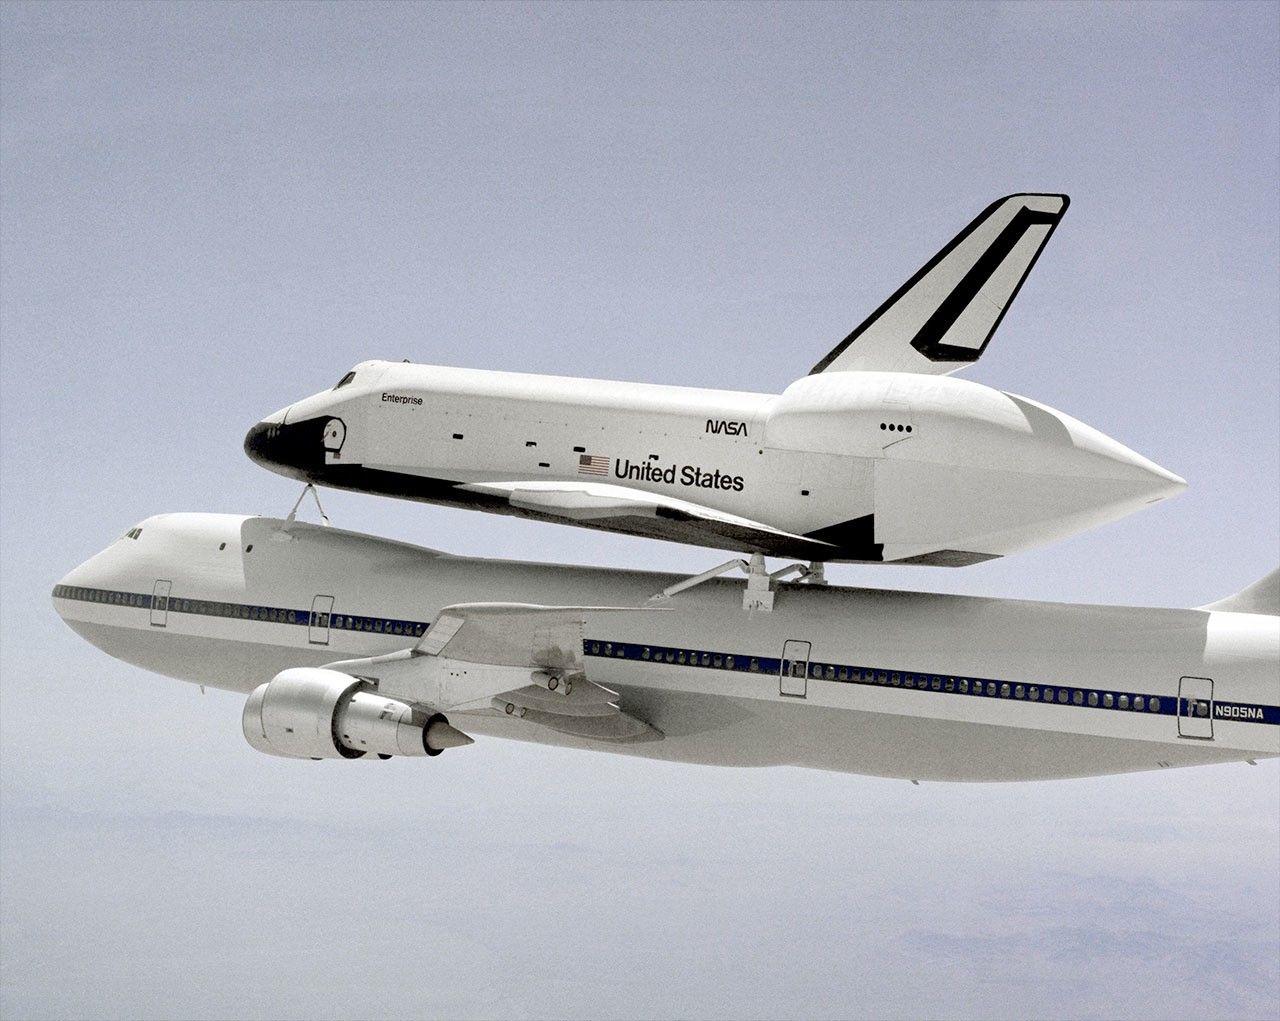 space shuttle enterprise - HD1280×1021